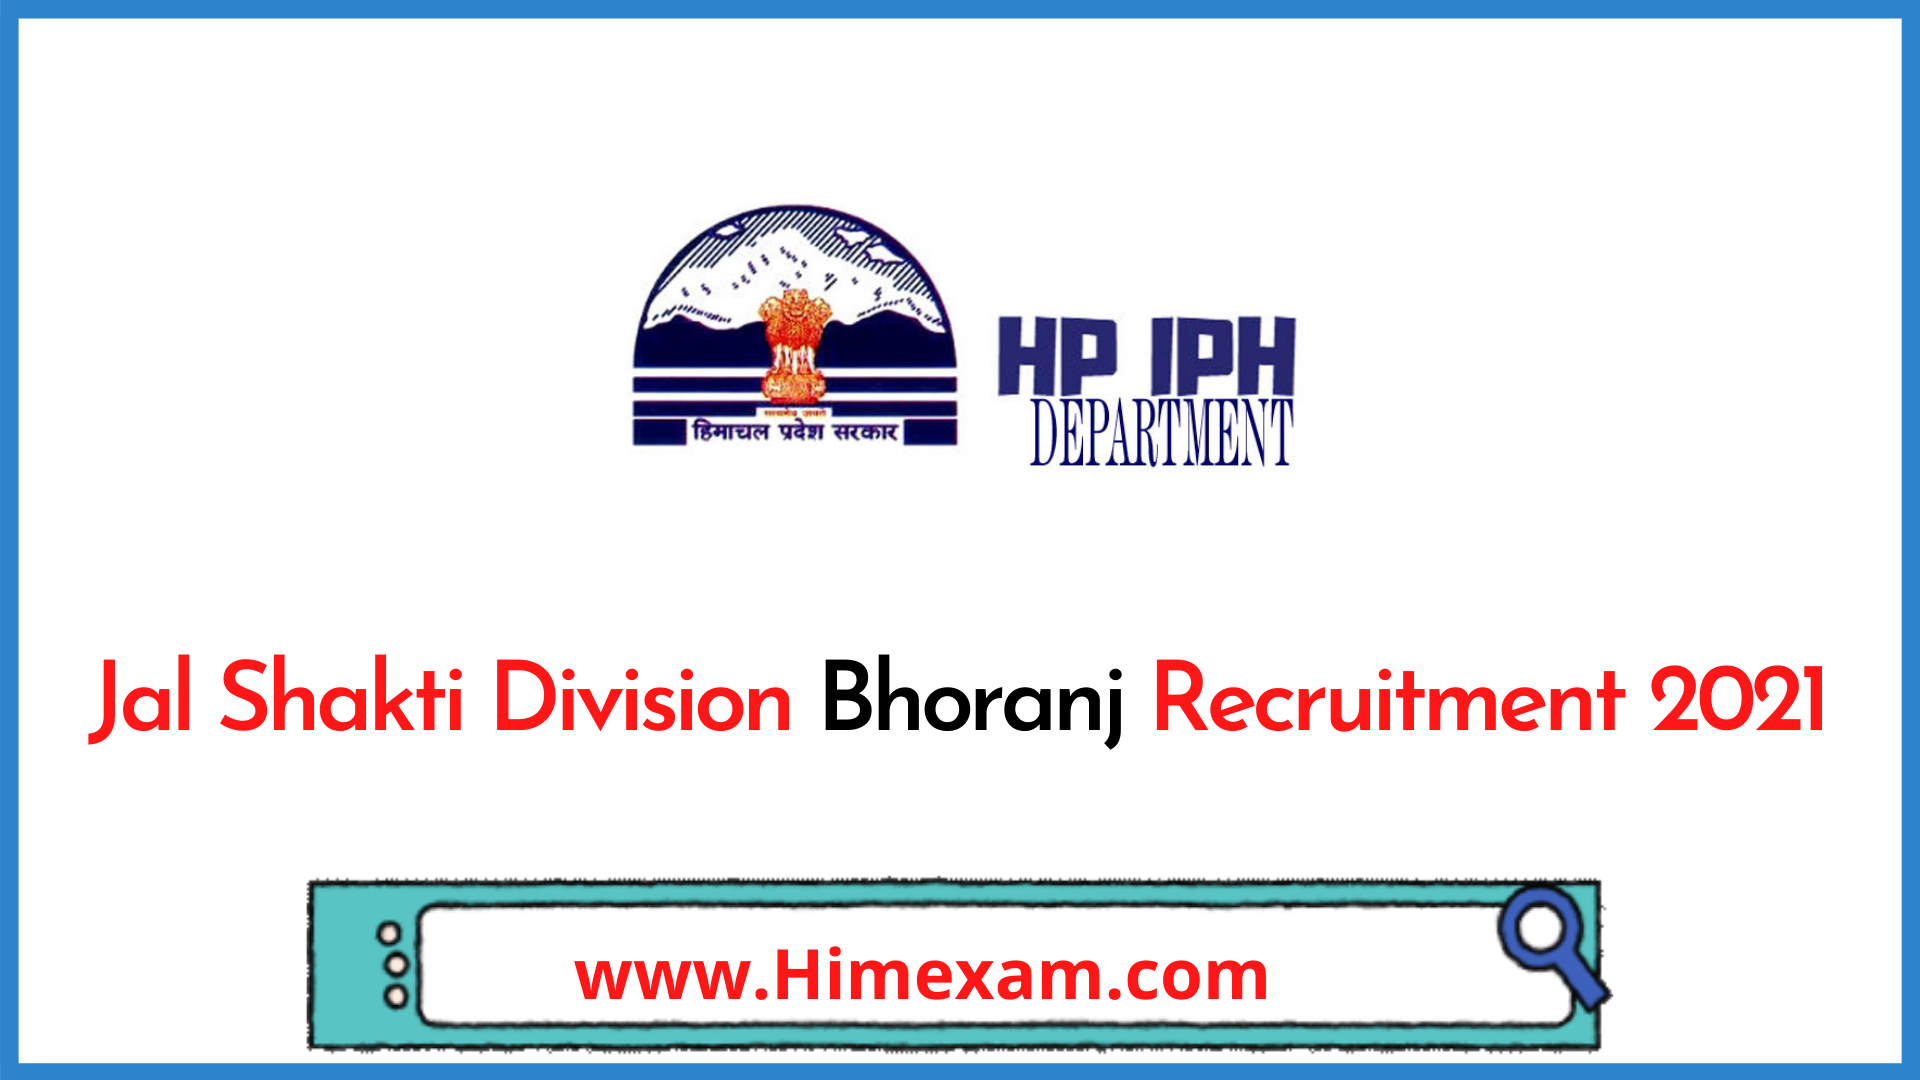 Jal Shakti Division Bhoranj  Recruitment 2021